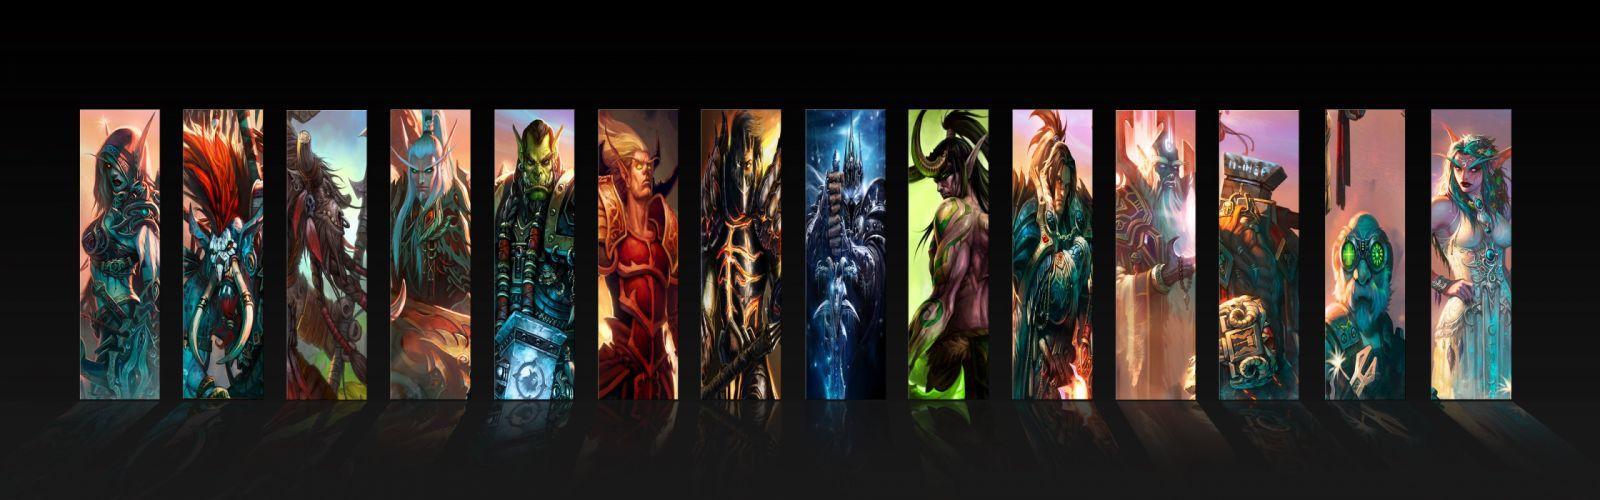 World of Warcraft Lich King deathwing thrall Sylvanas Windrunner vol'jin cairne bloodhoof wallpaper